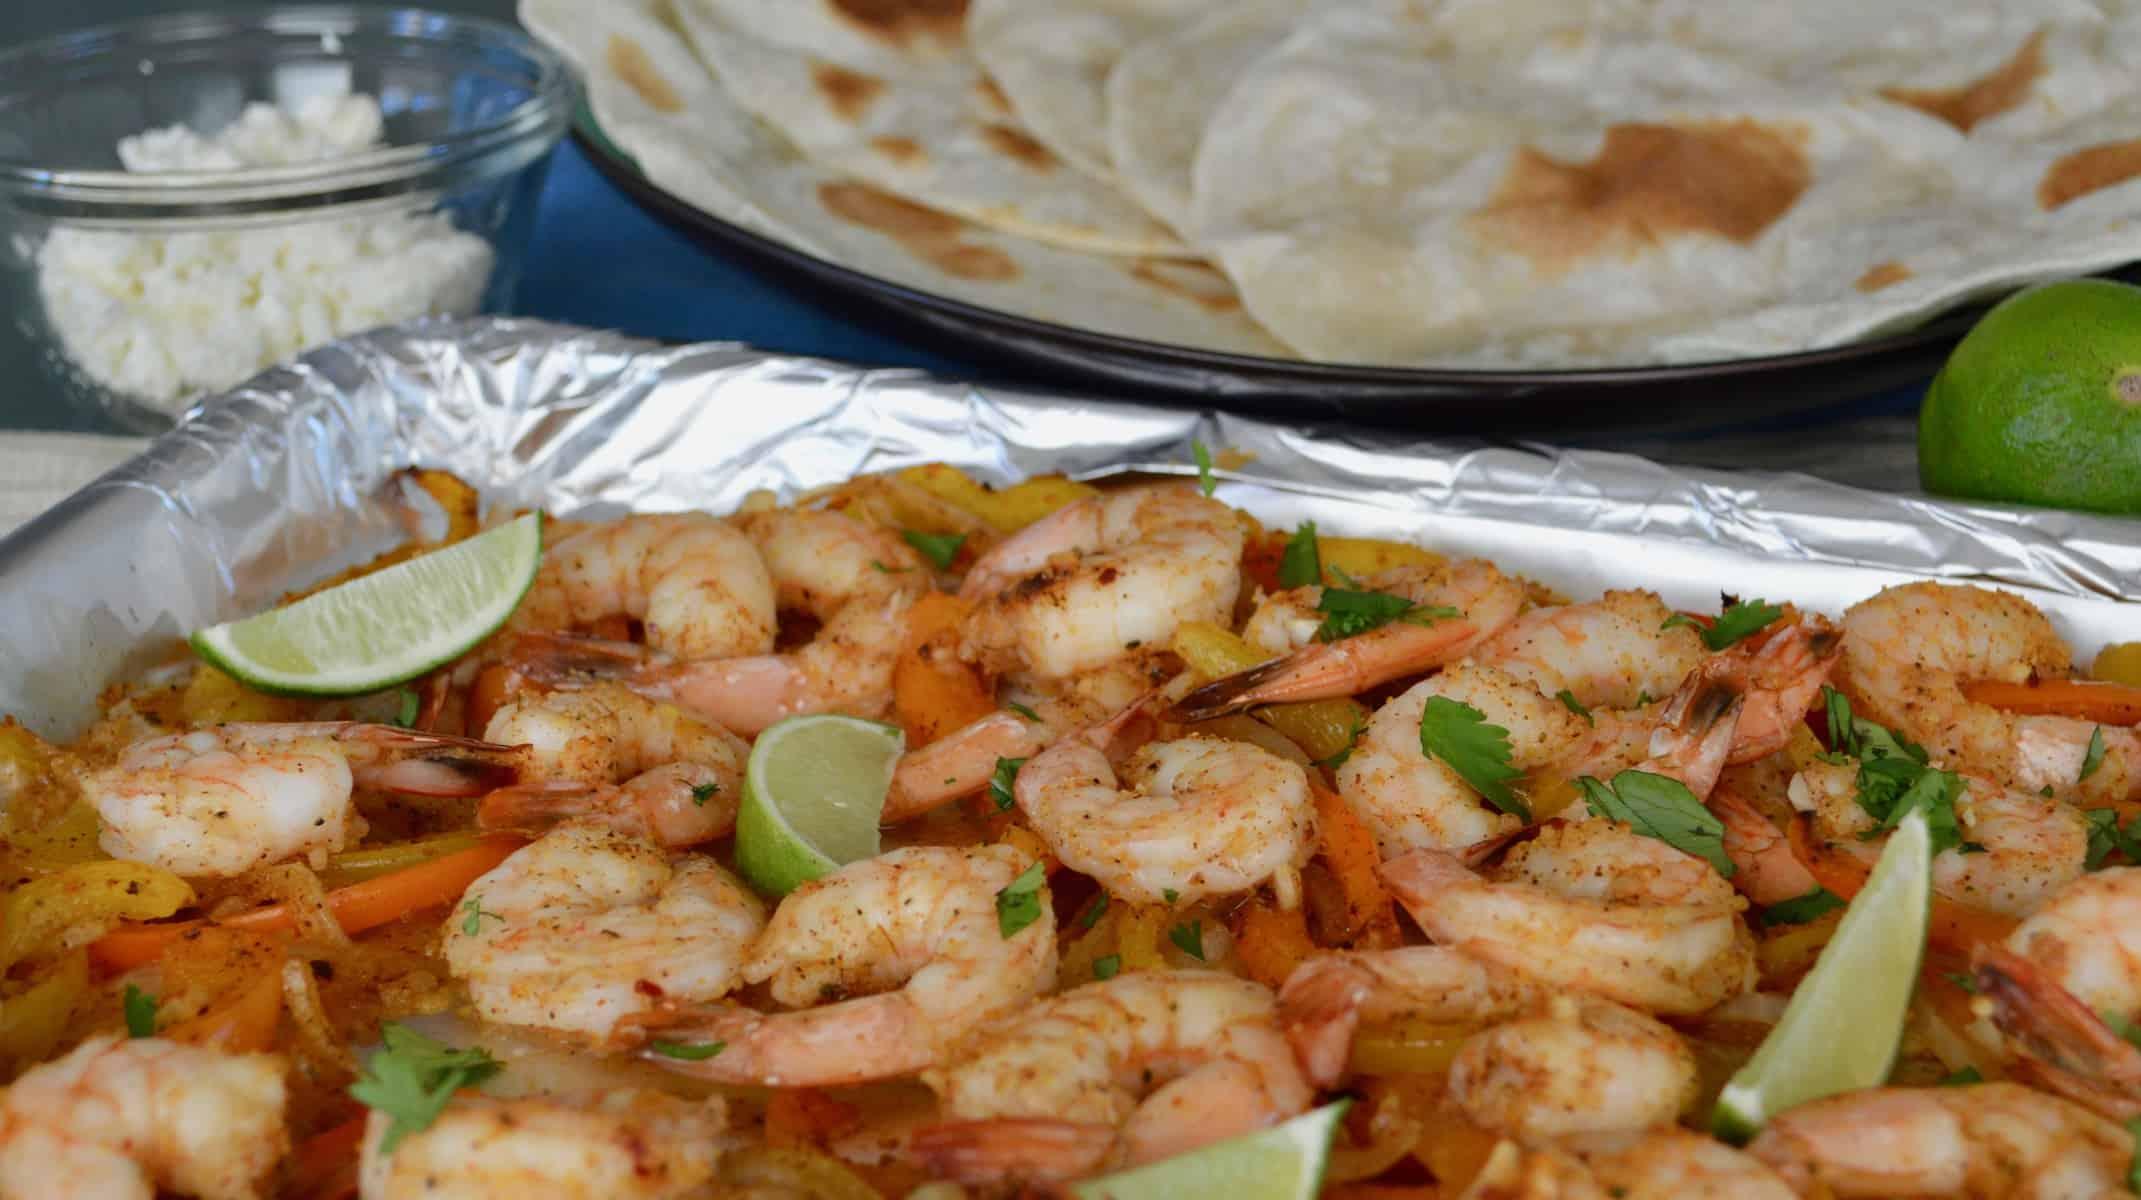 tortillas, cheese, and shrimp